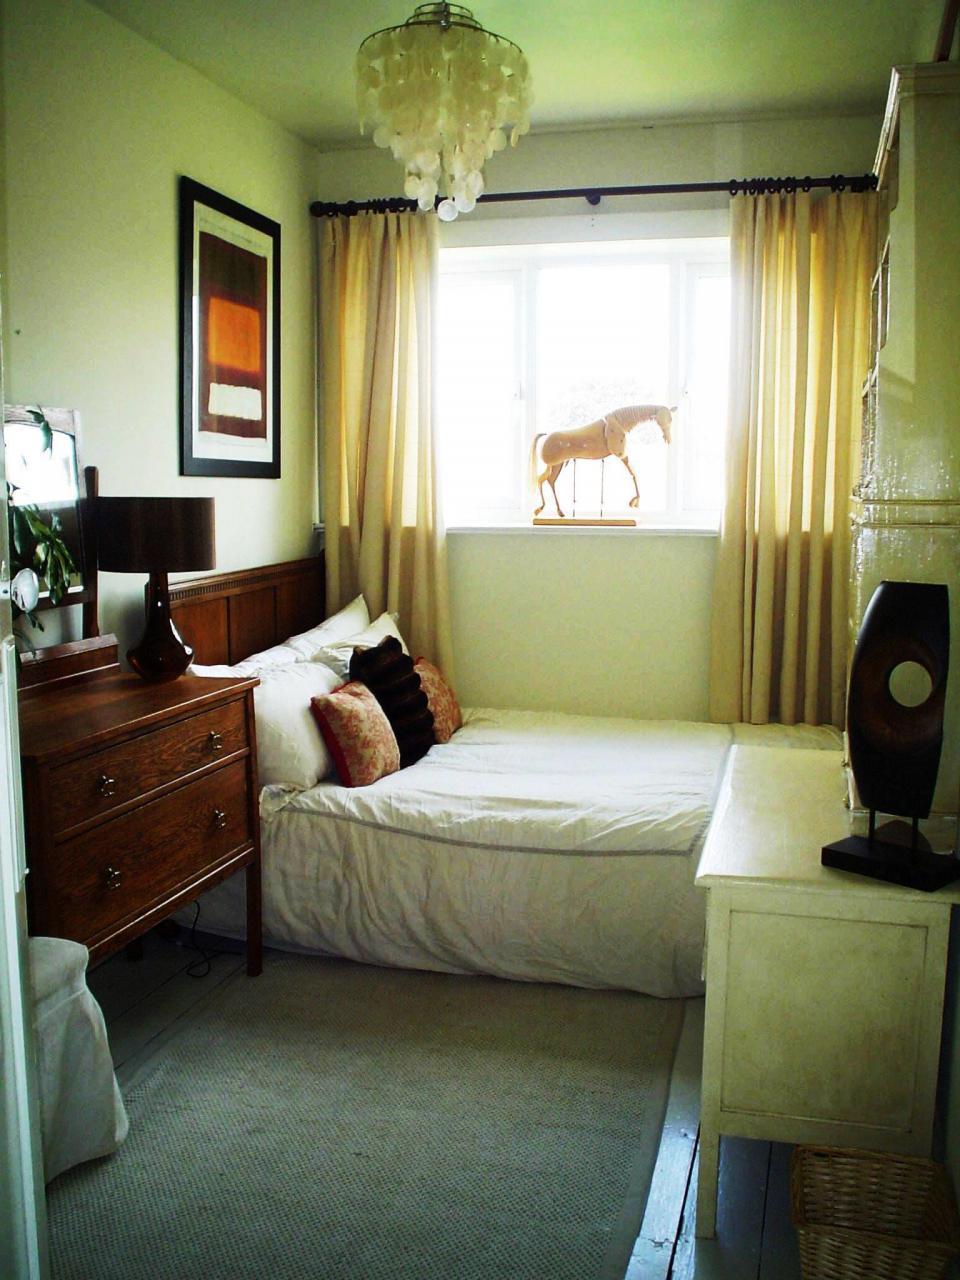 Small bedroom decorating ideas 3 home interior design ideas Small ...